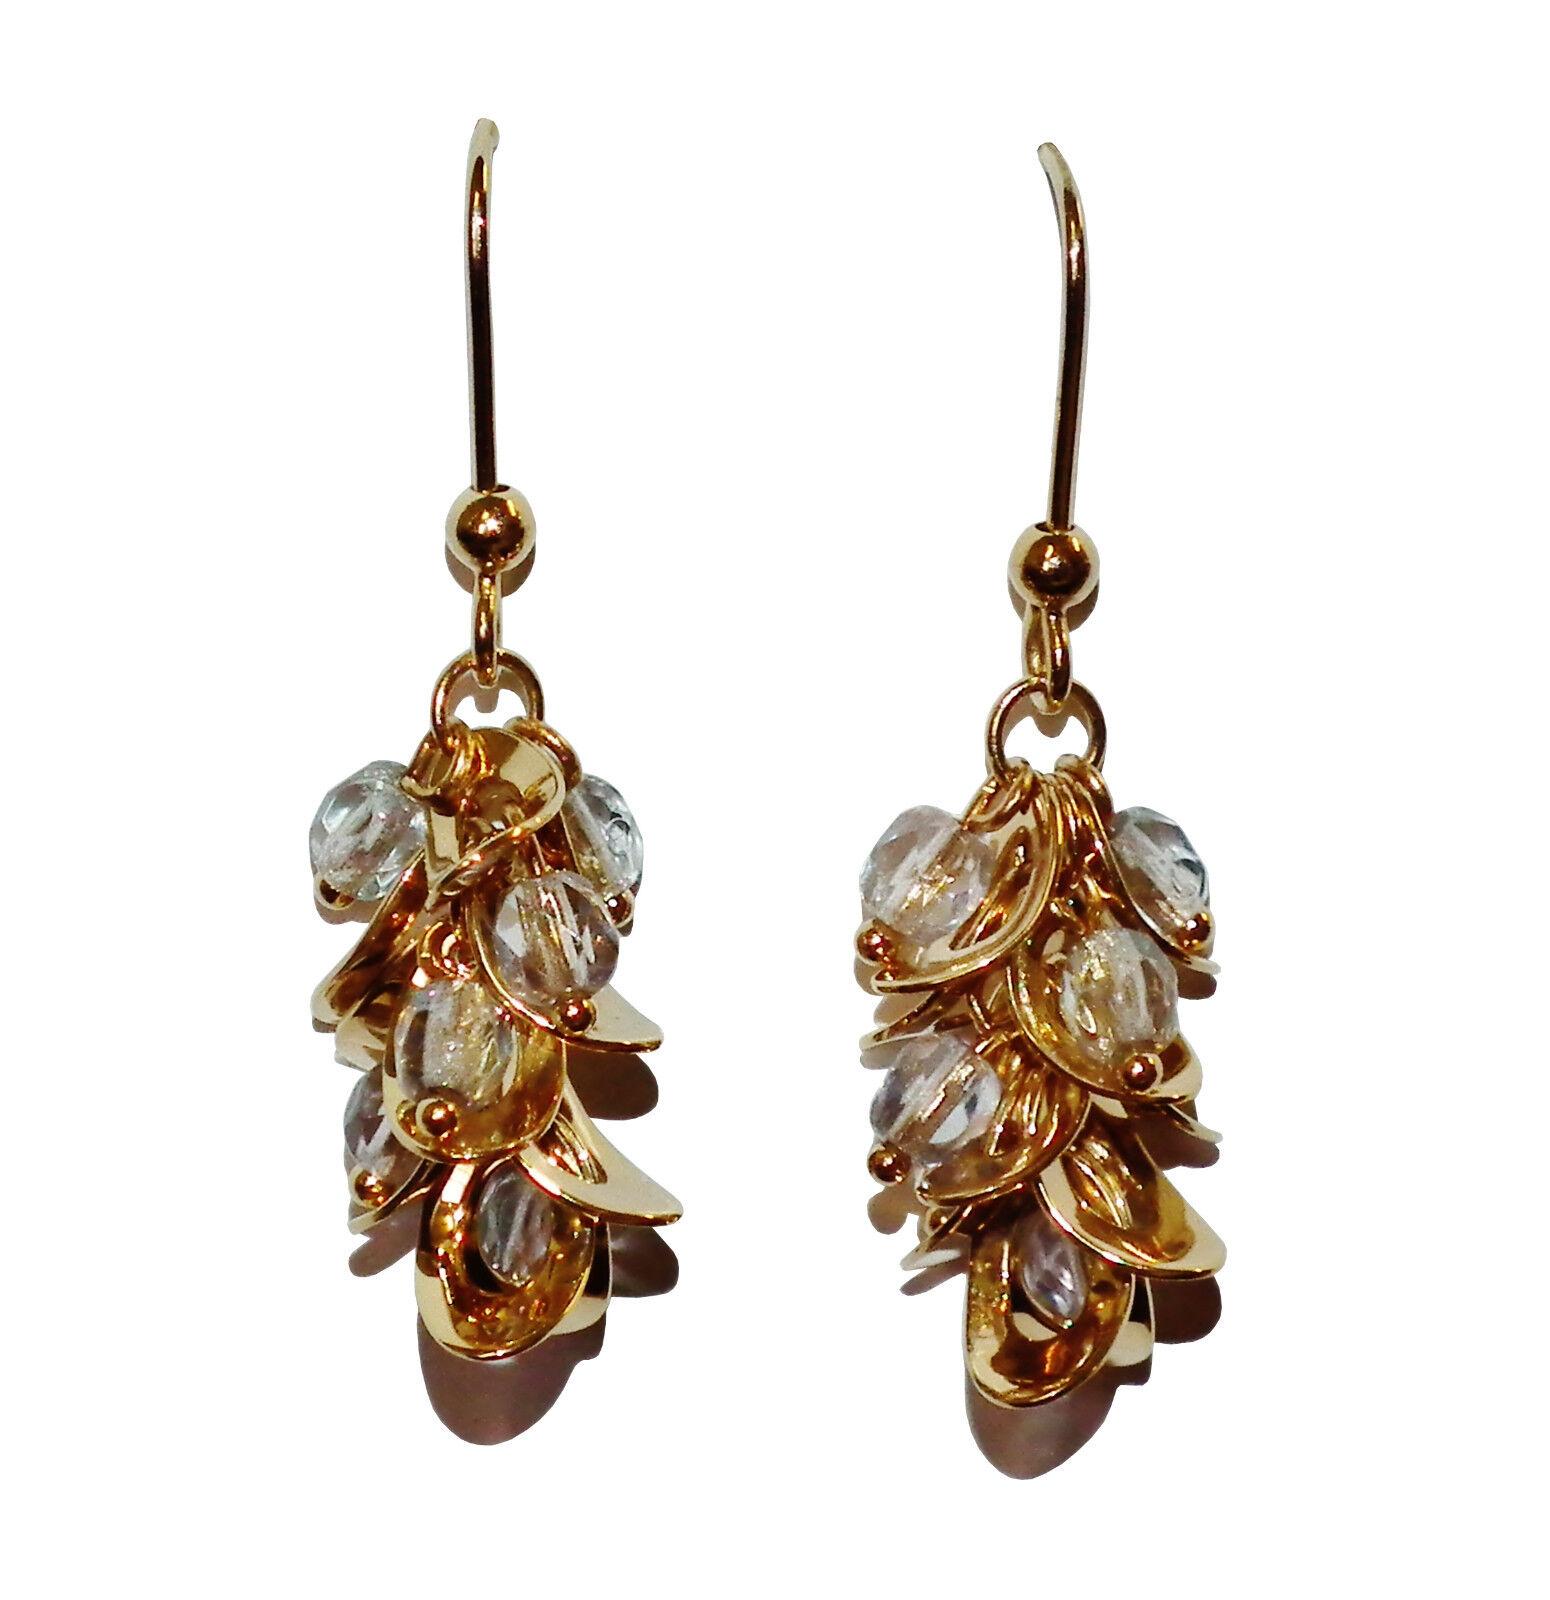 Fully Hallmarked 9ct Yellow gold & Bead Fancy Drop Earrings